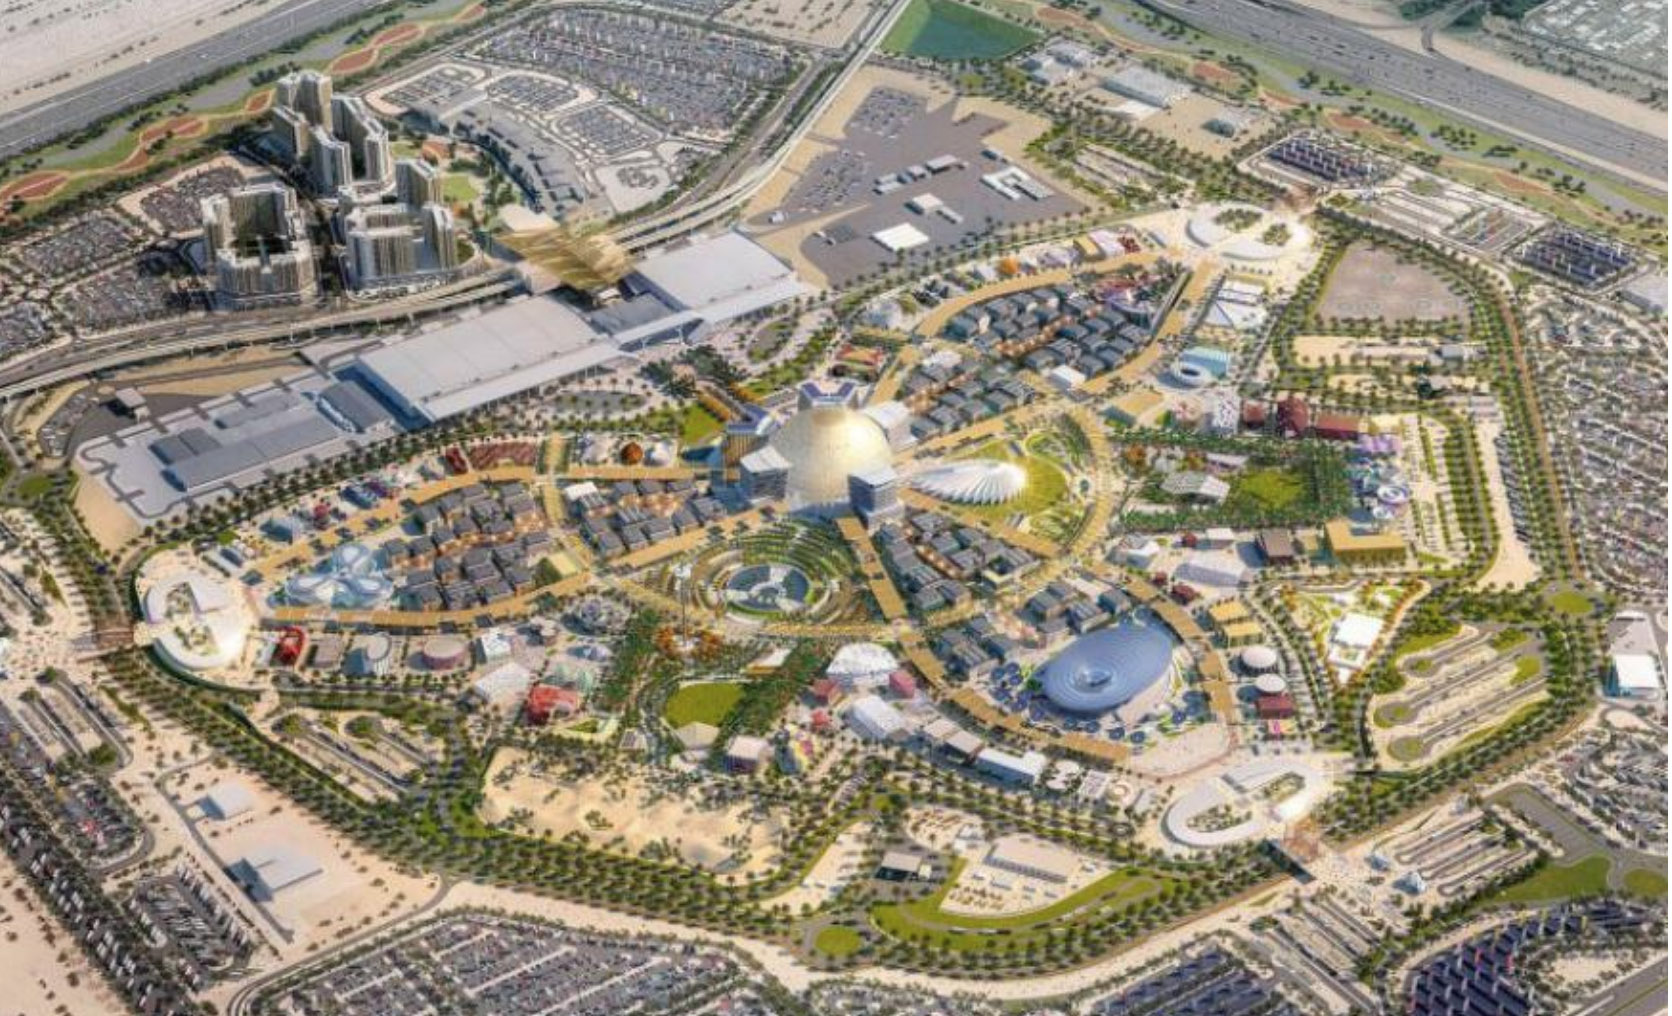 Expo 2020 Dubai to explore date change under impact of Covid-19